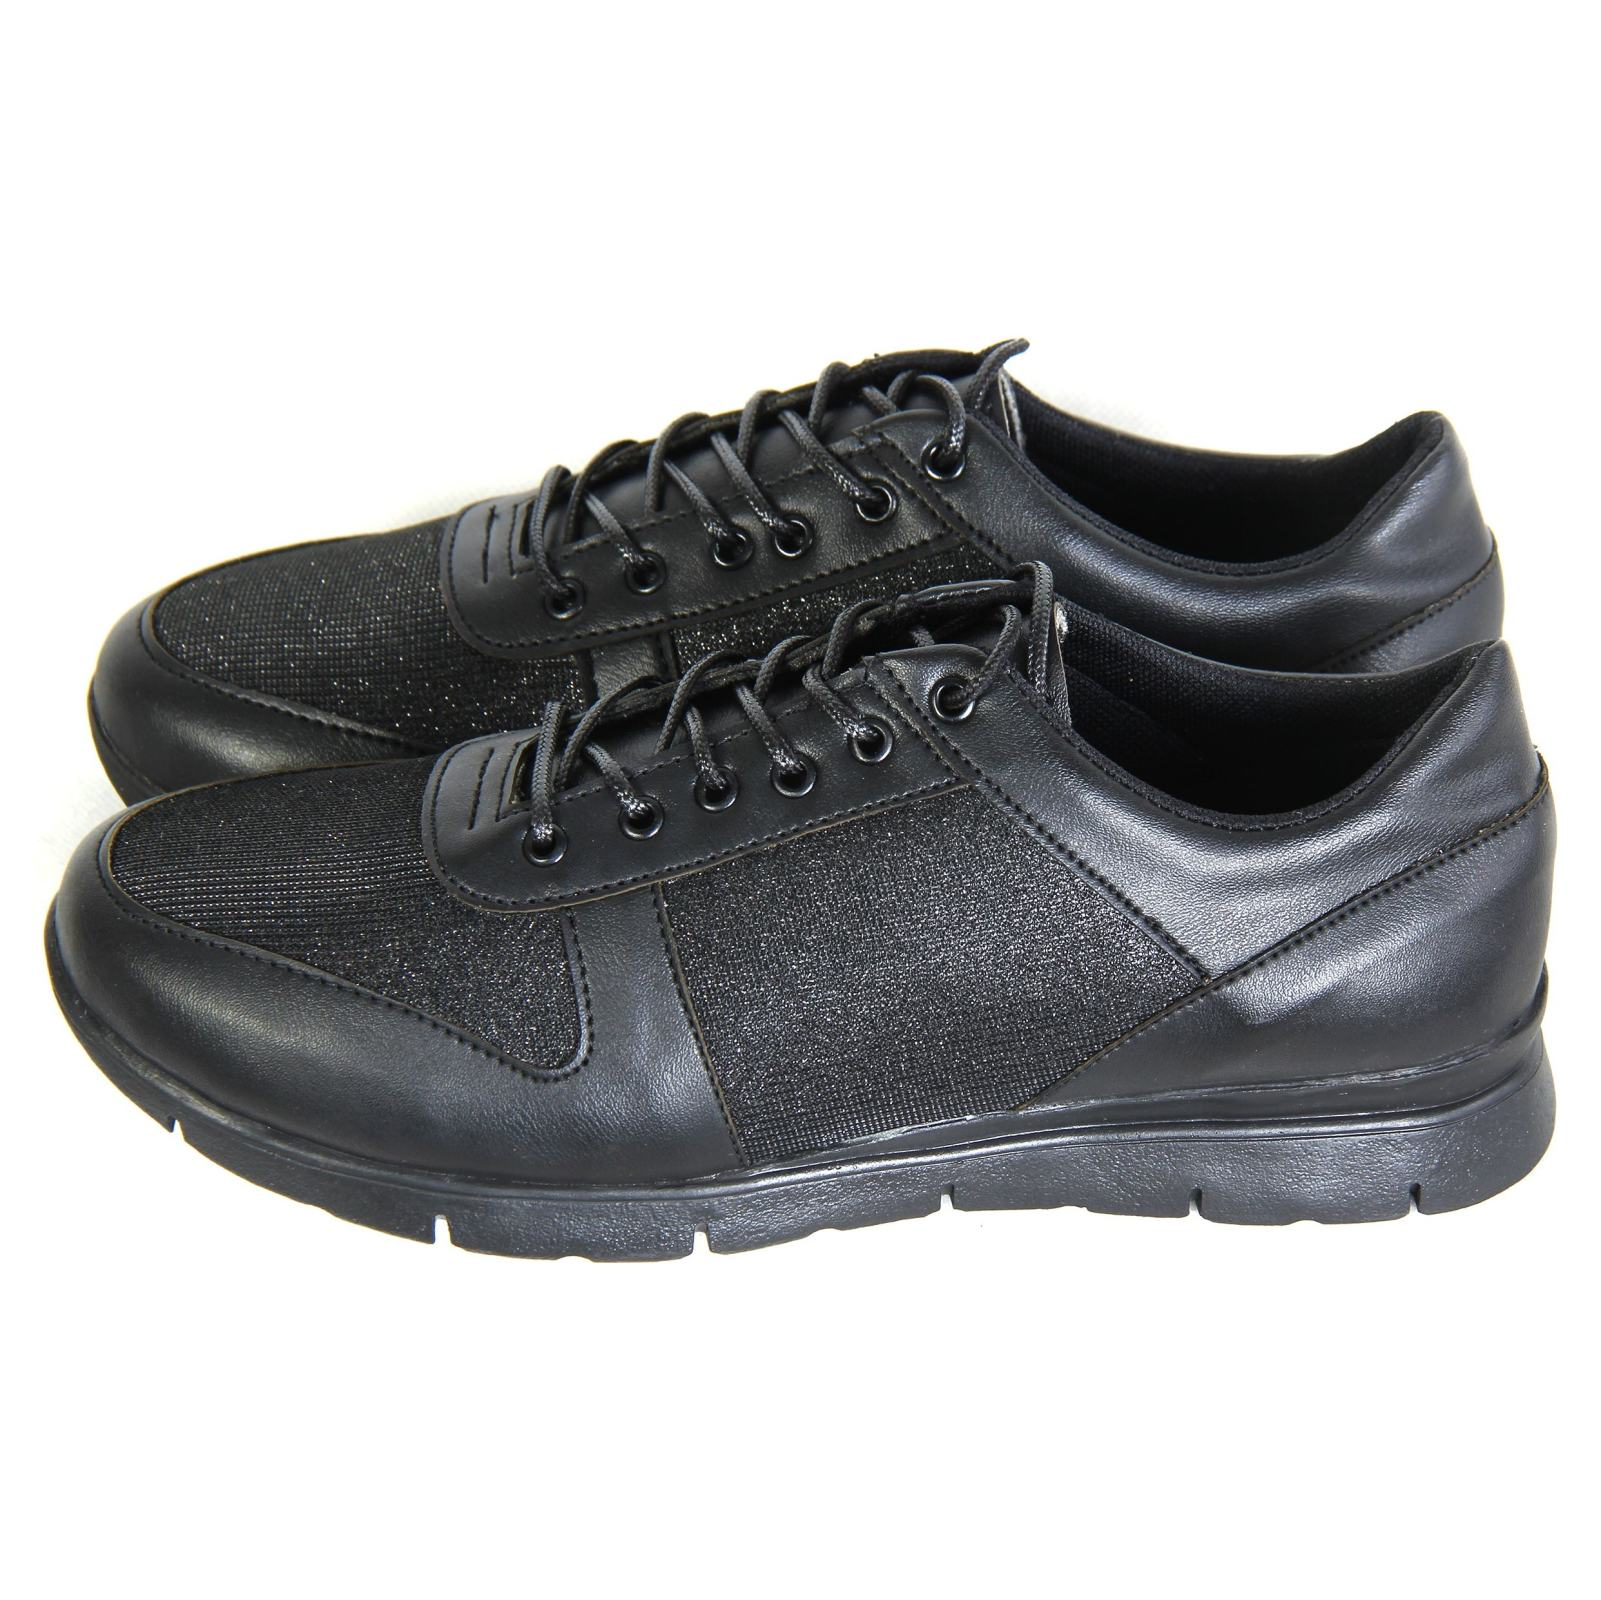 کفش روزمره زنانه کد 013 main 1 3